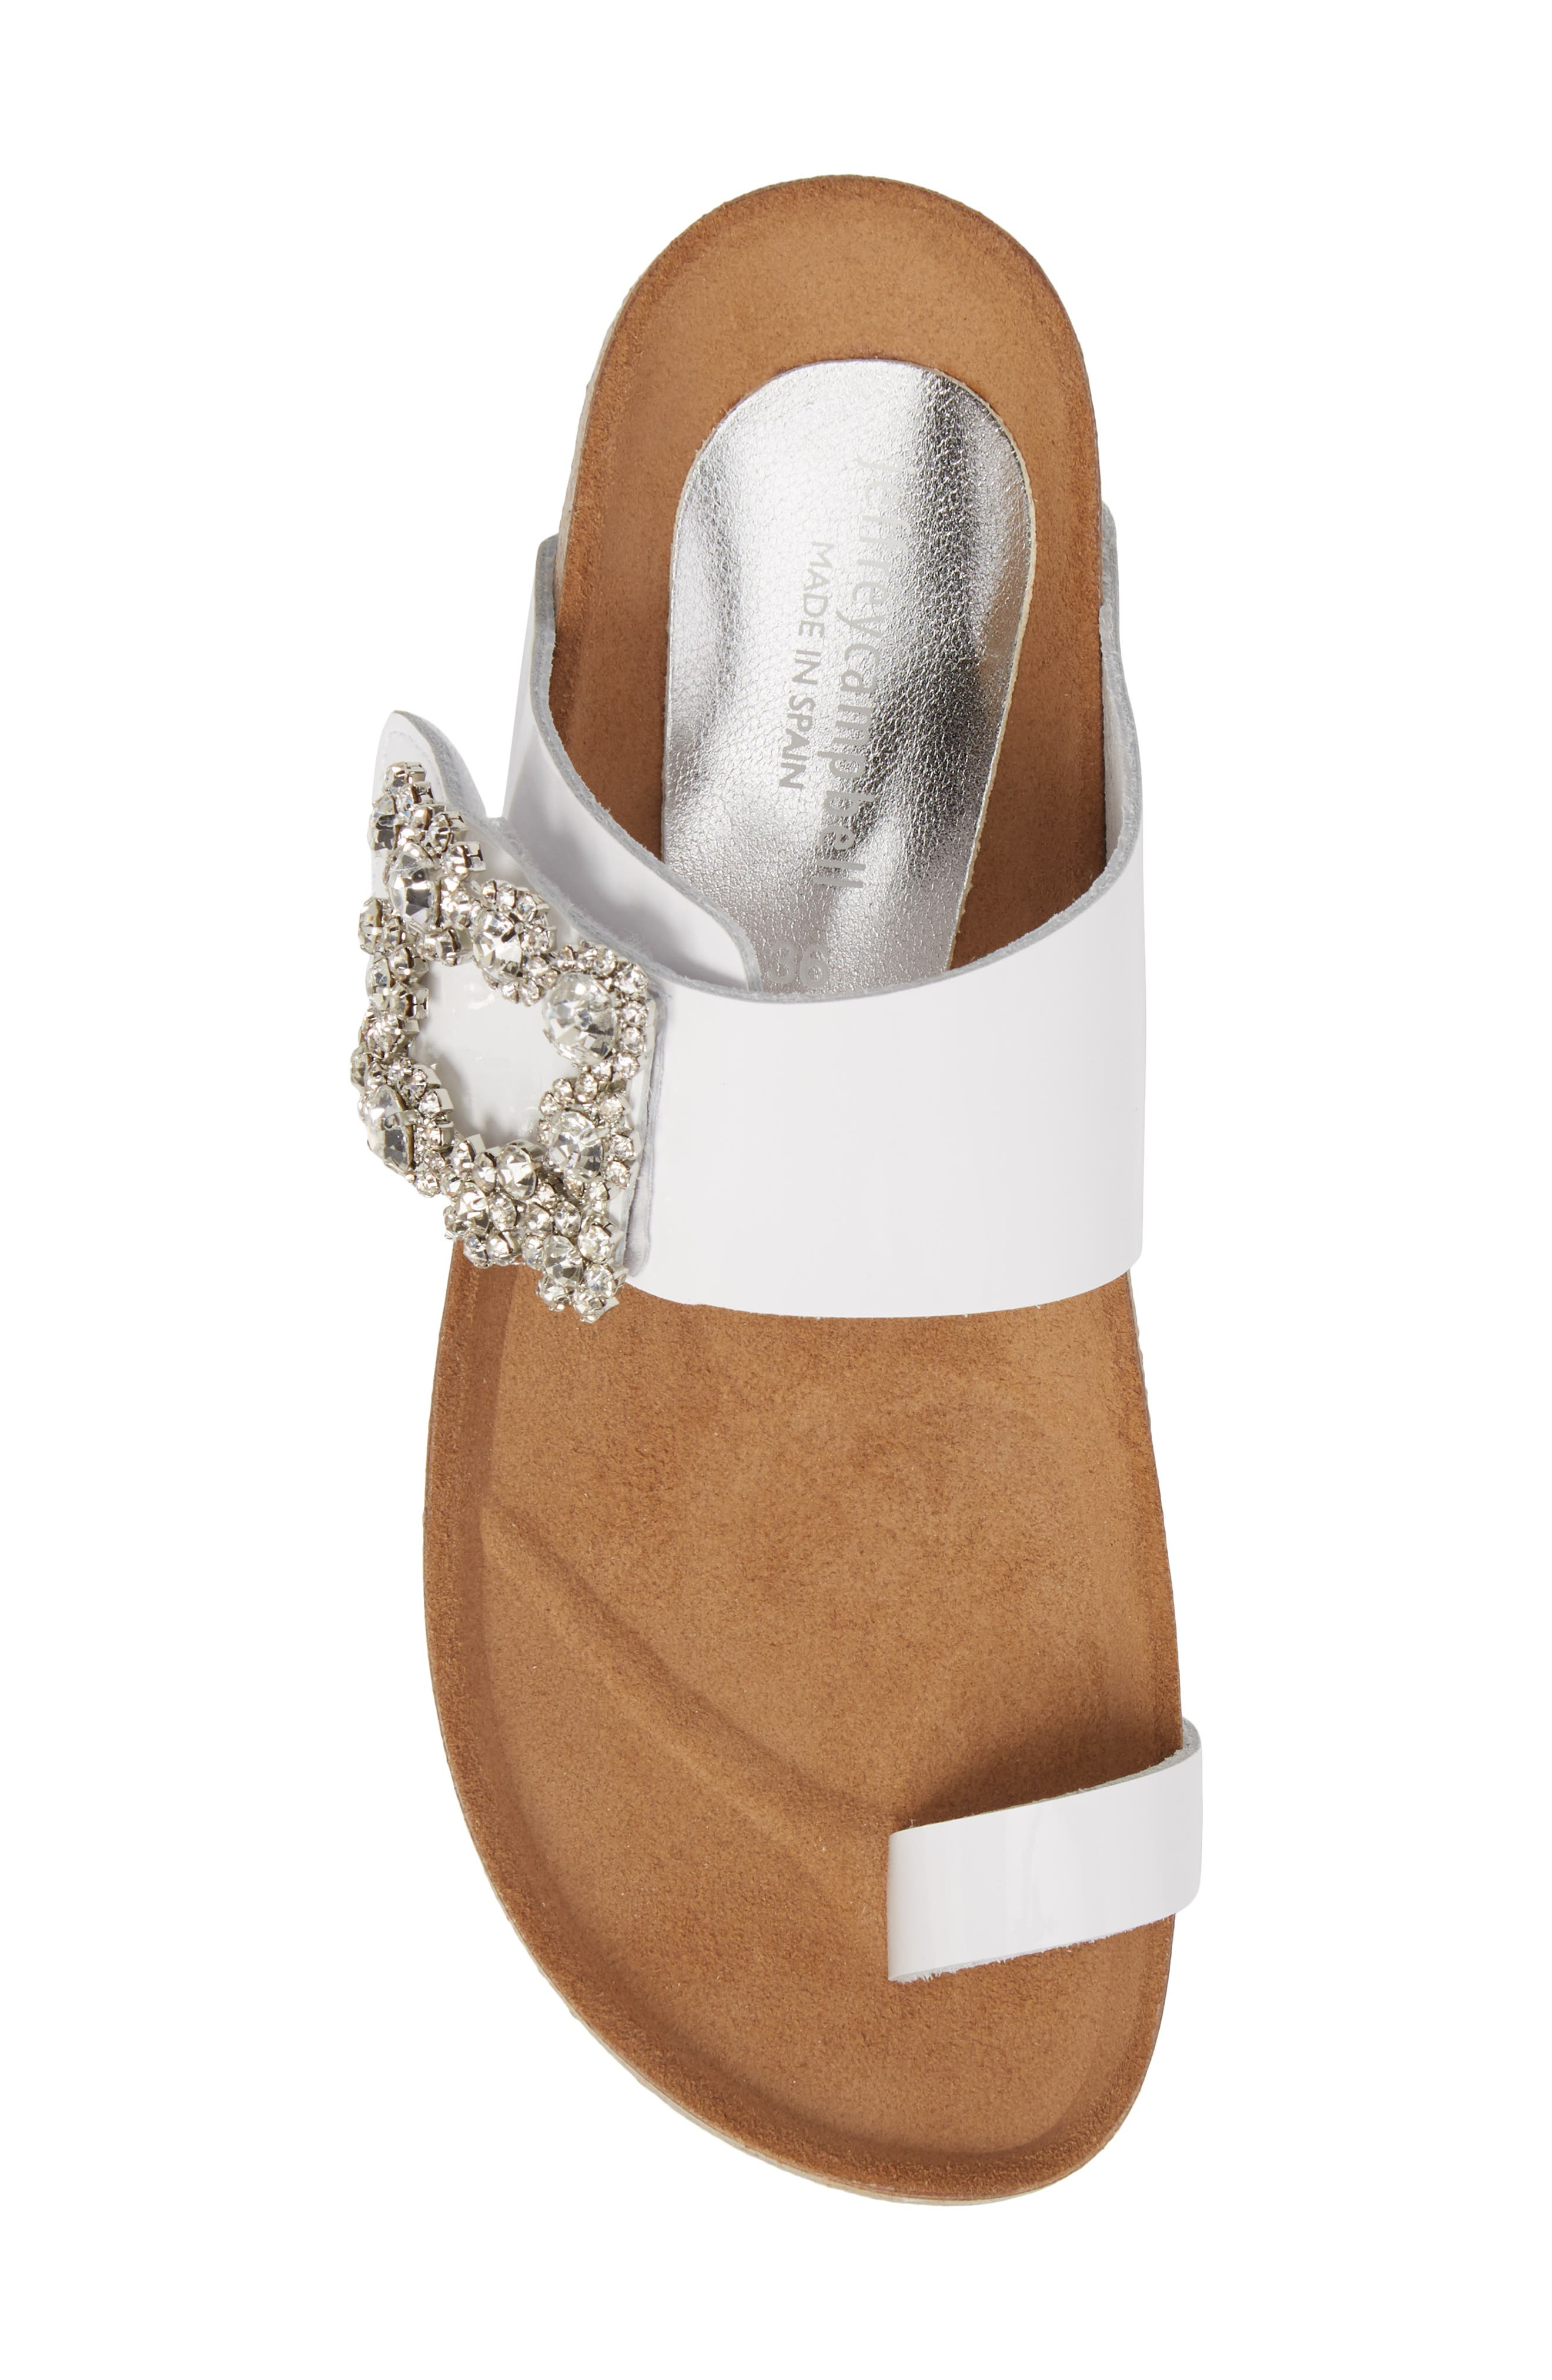 Bianca Embellished Slide Sandal,                             Alternate thumbnail 5, color,                             White Patent/ Silver